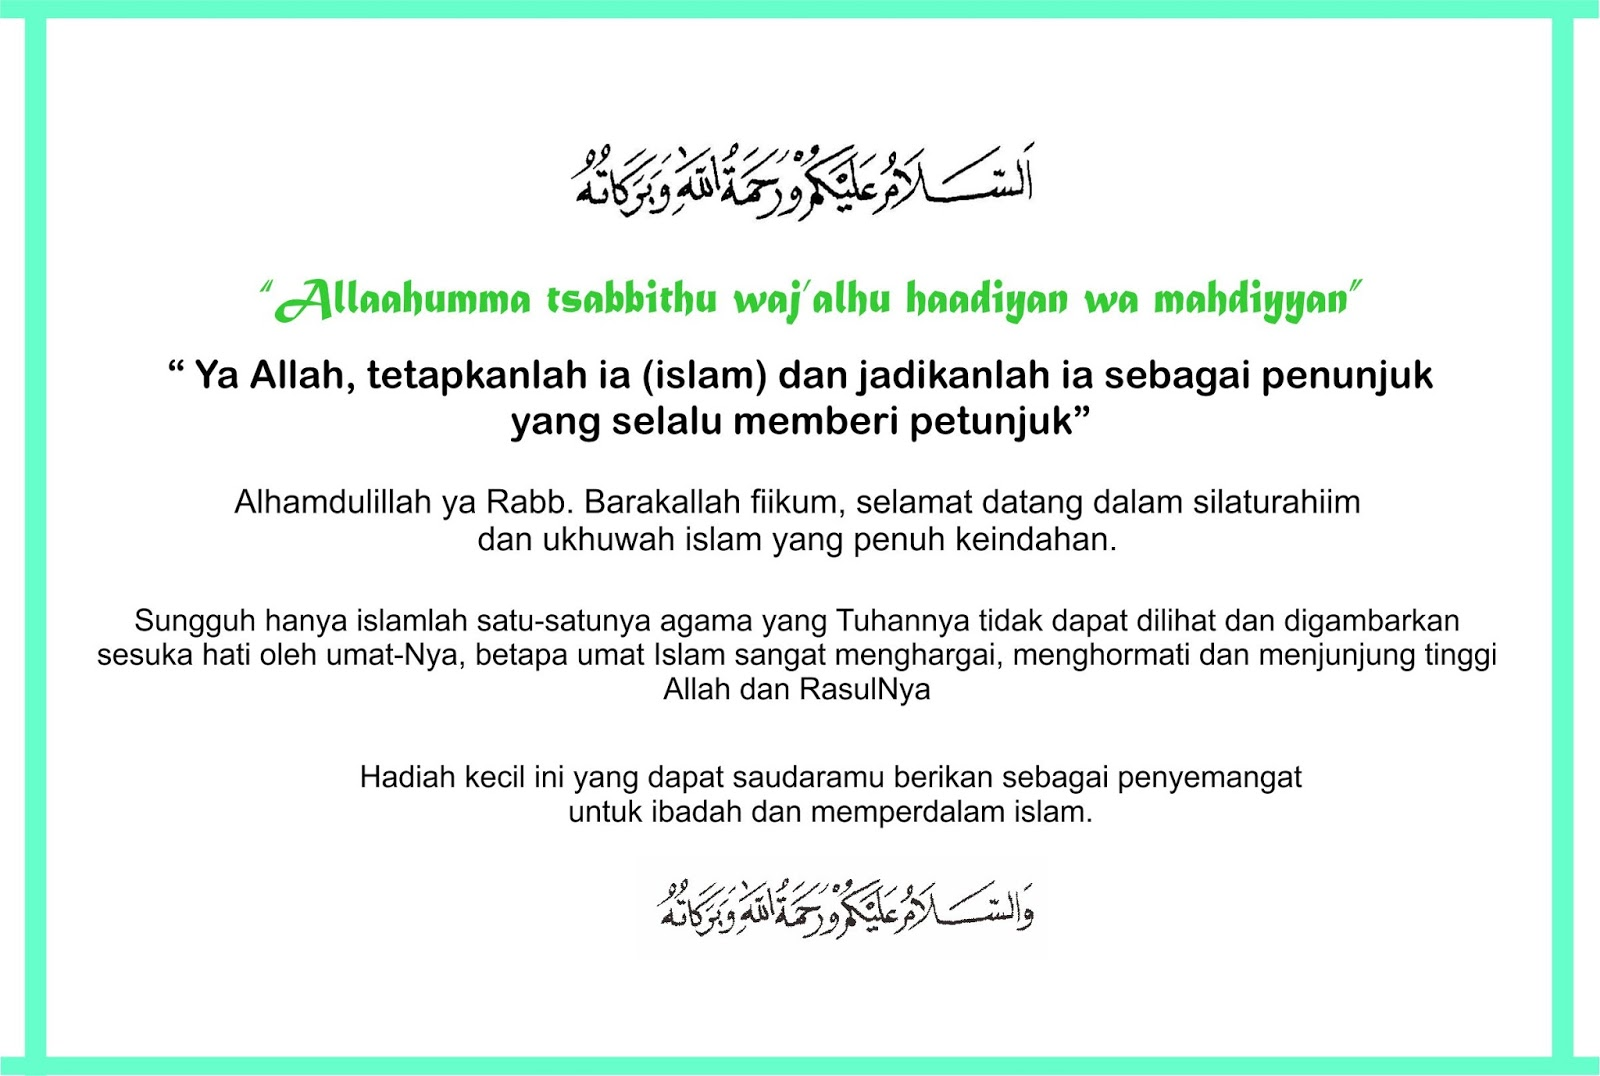 Kartu Ucapan Untuk Saudara Yang Baru Masuk Islam Taupikwida Blog